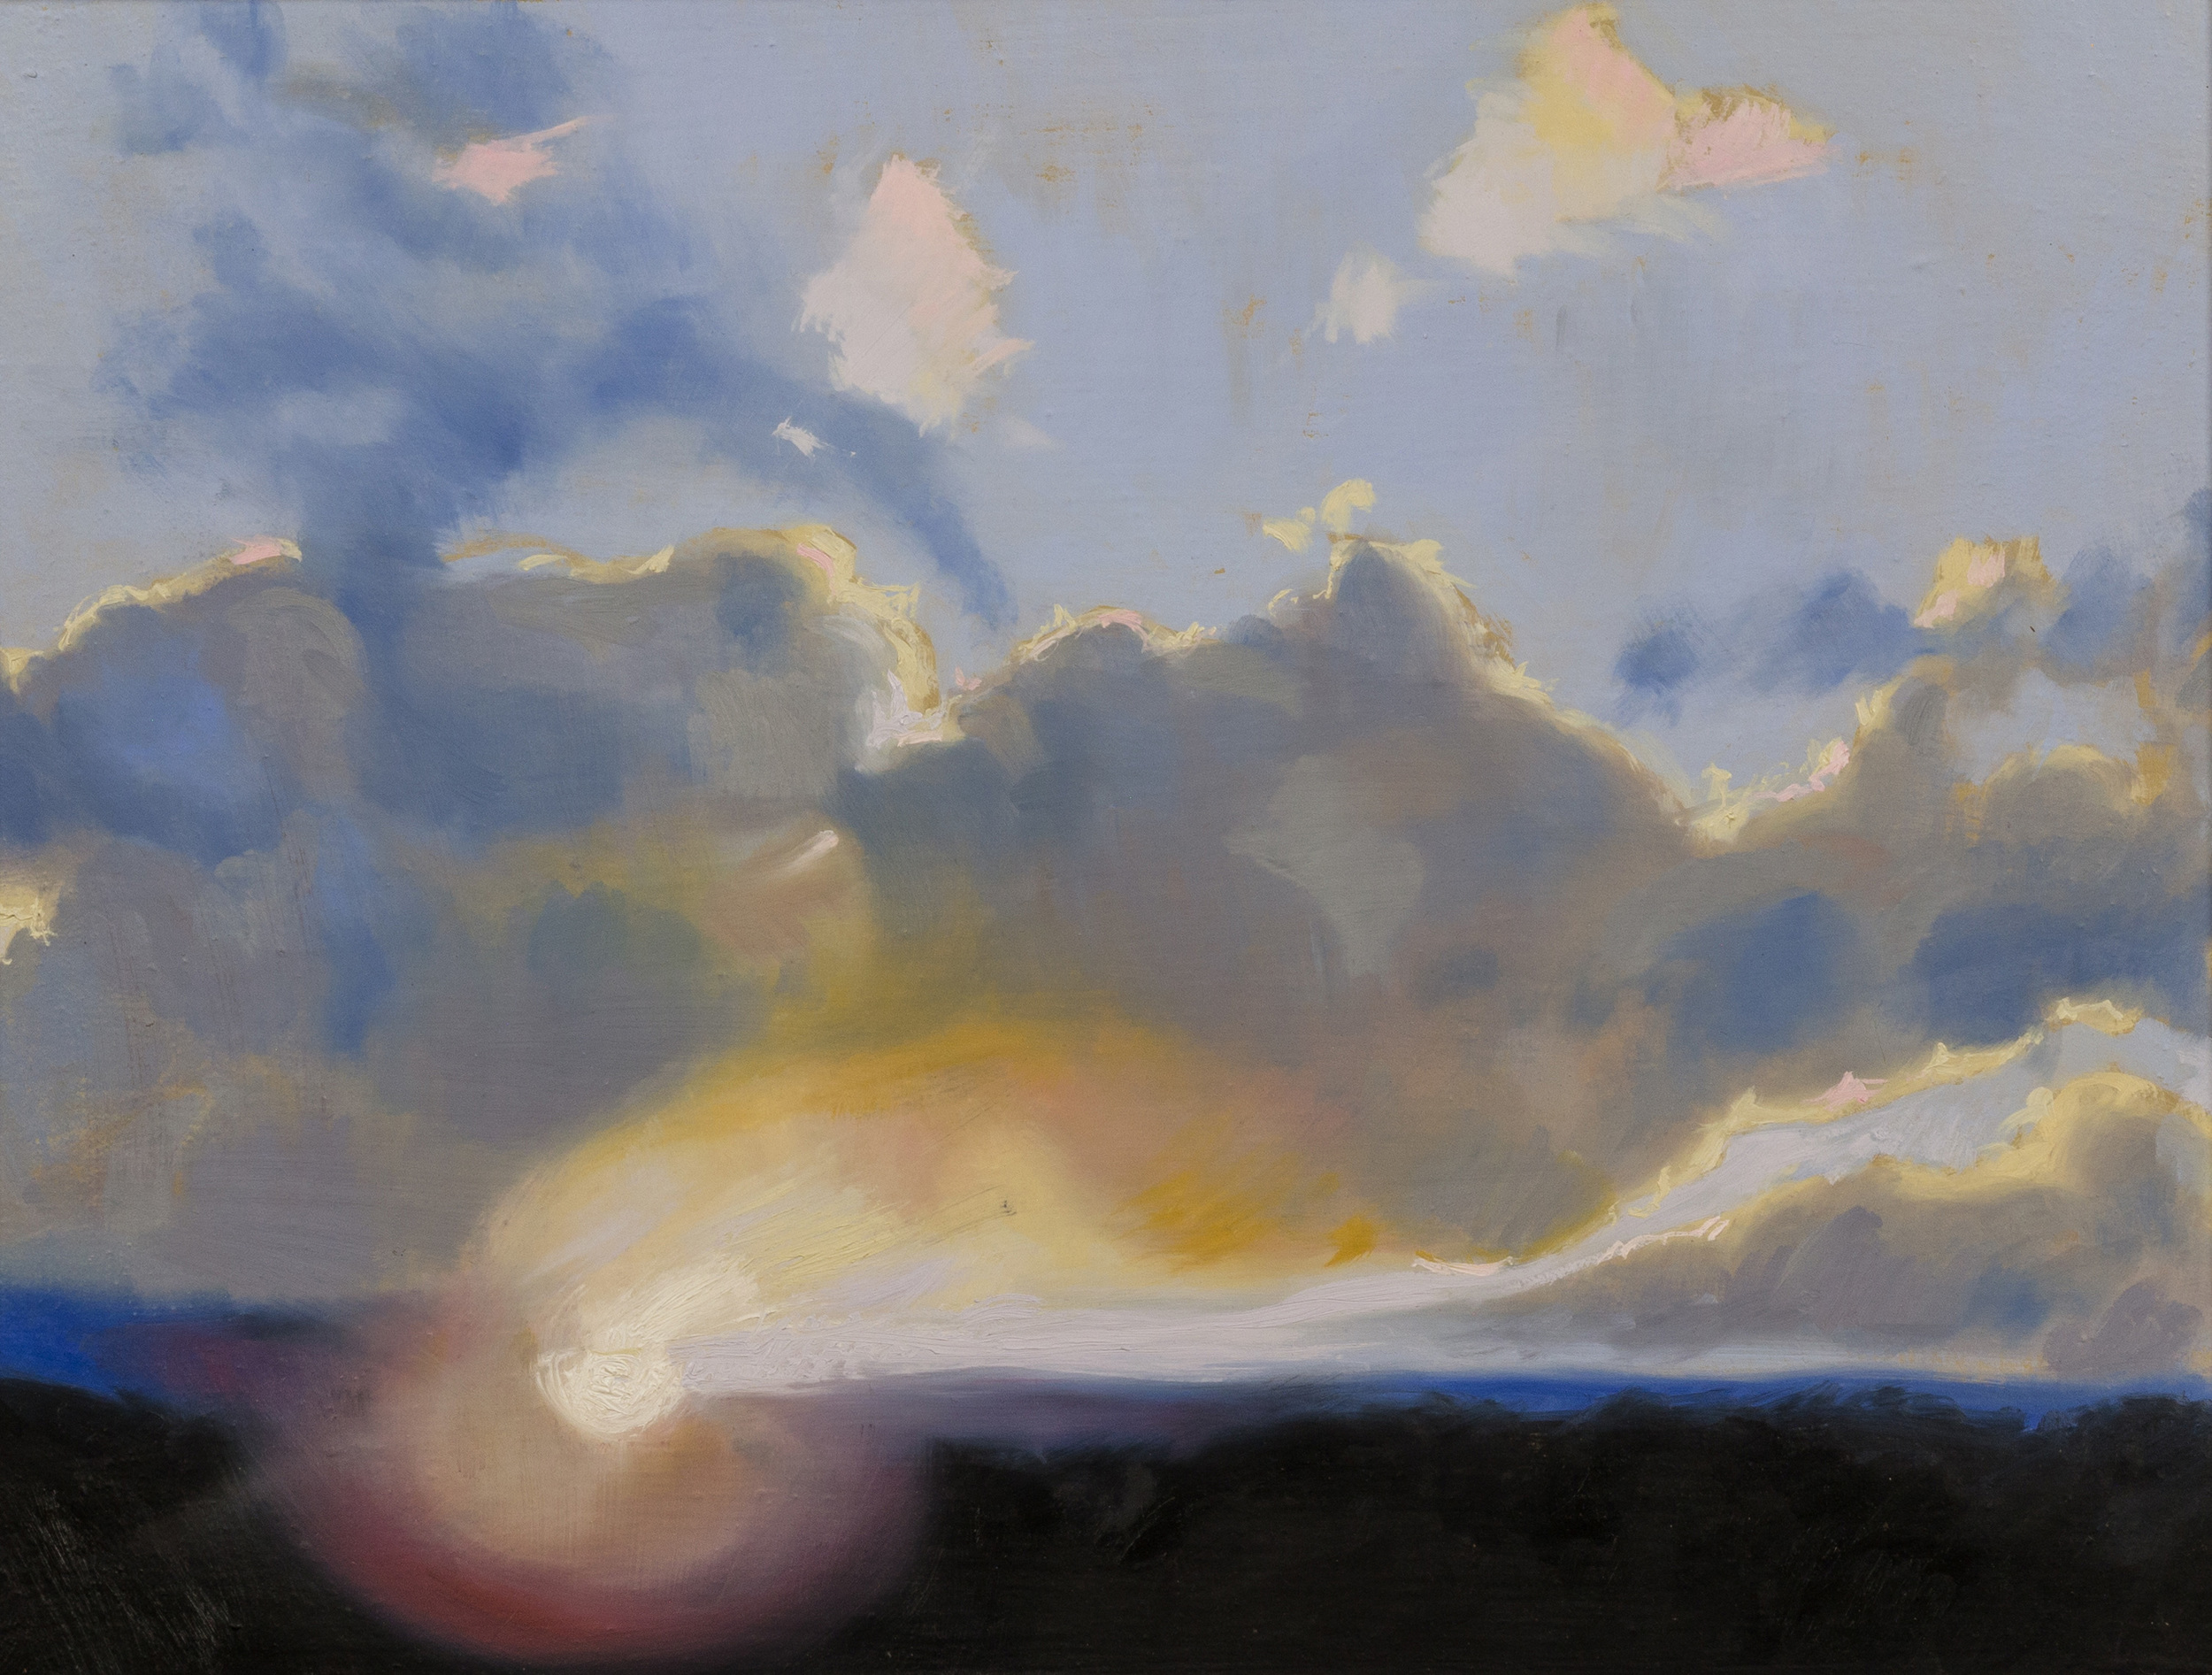 Theophania , olio su tela, cm 30x40, 2013